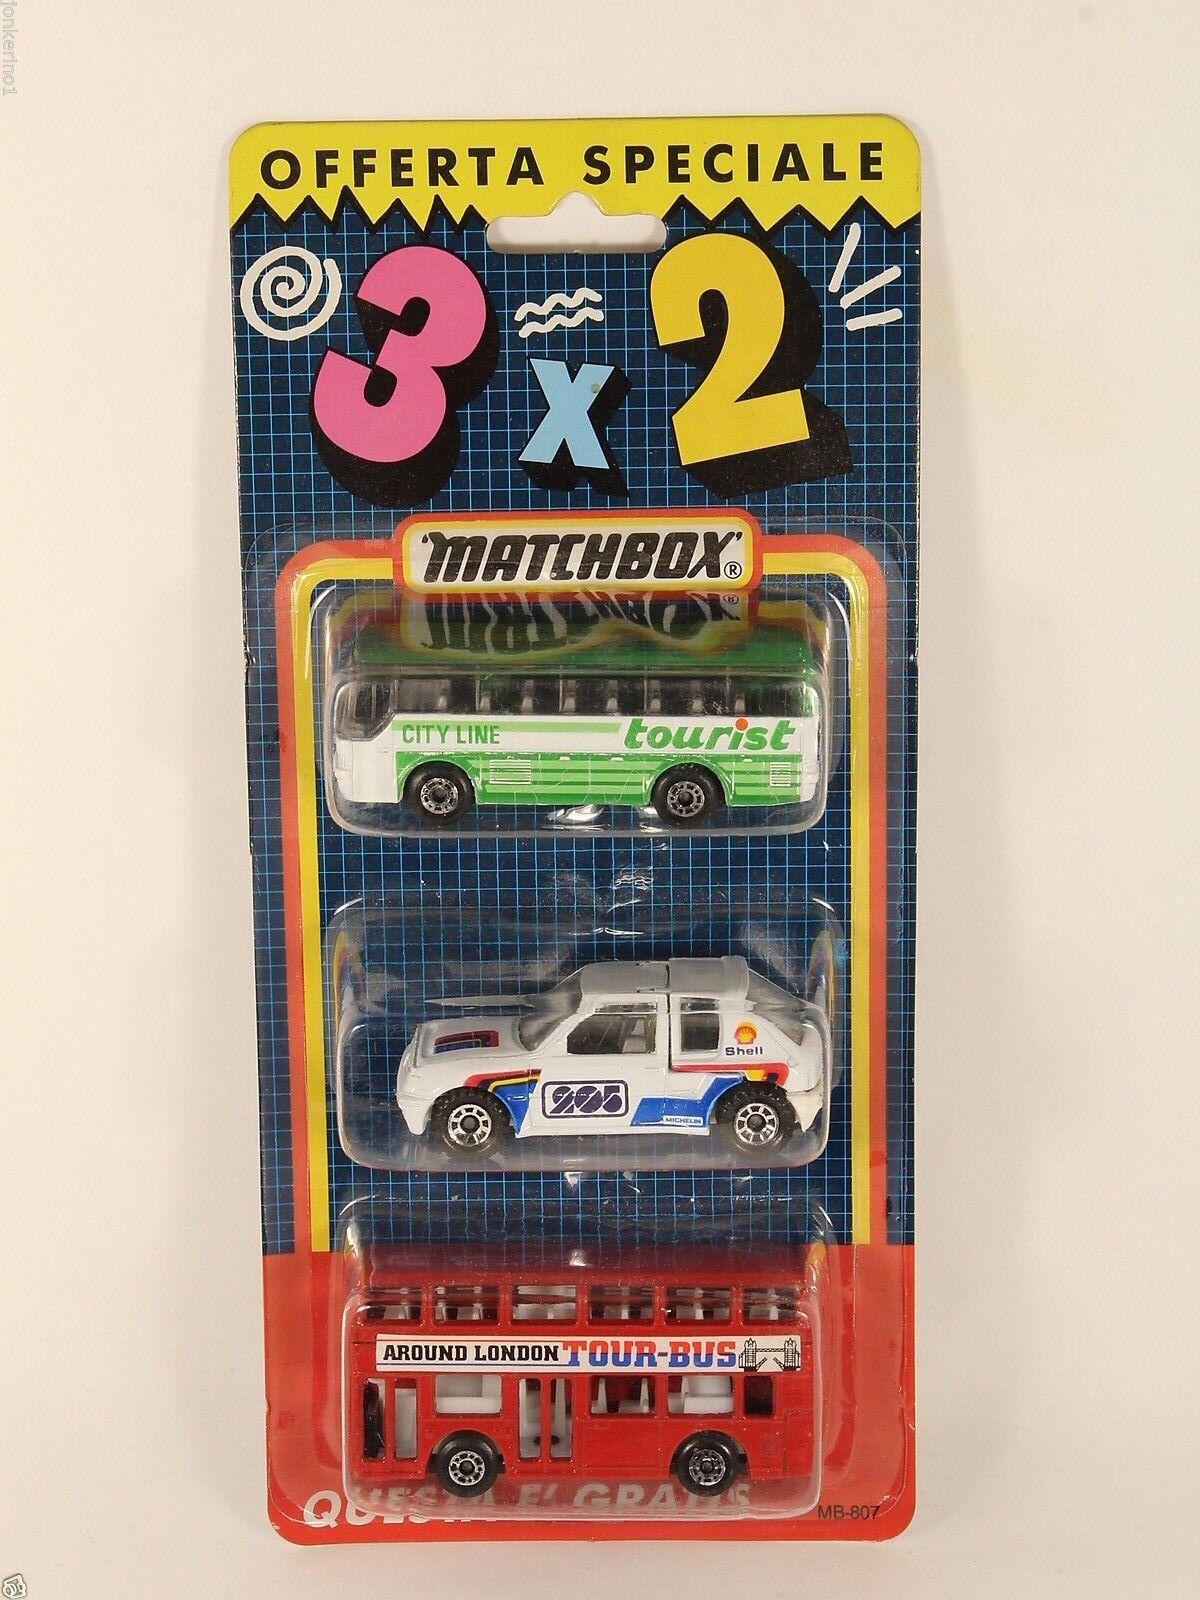 Matchbox mb-807 offerta 3x2 bus city line peugeot 205 london bus mib [of3-82]